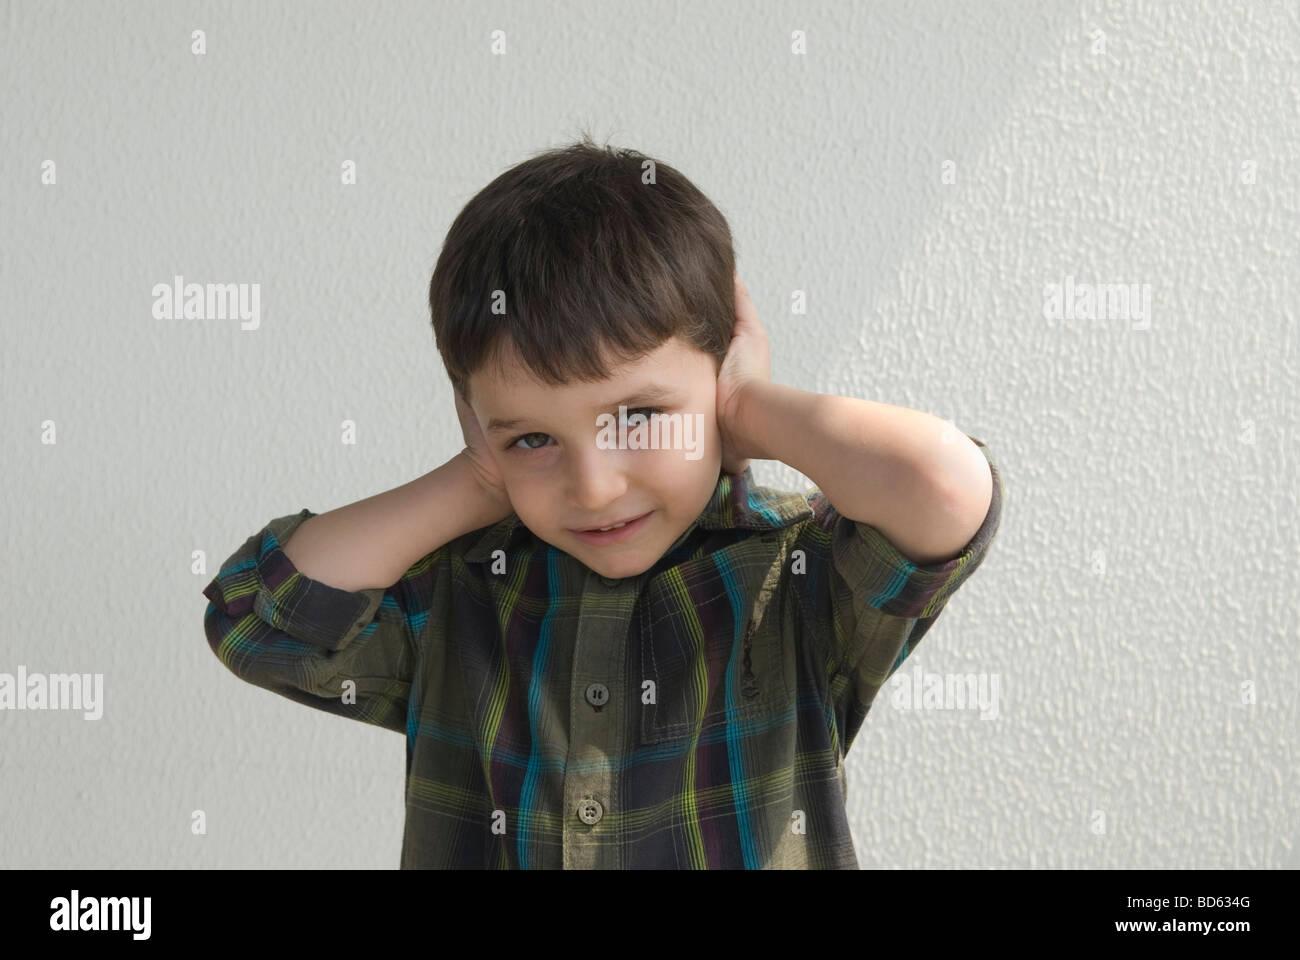 Little boy hands over ears - Stock Image